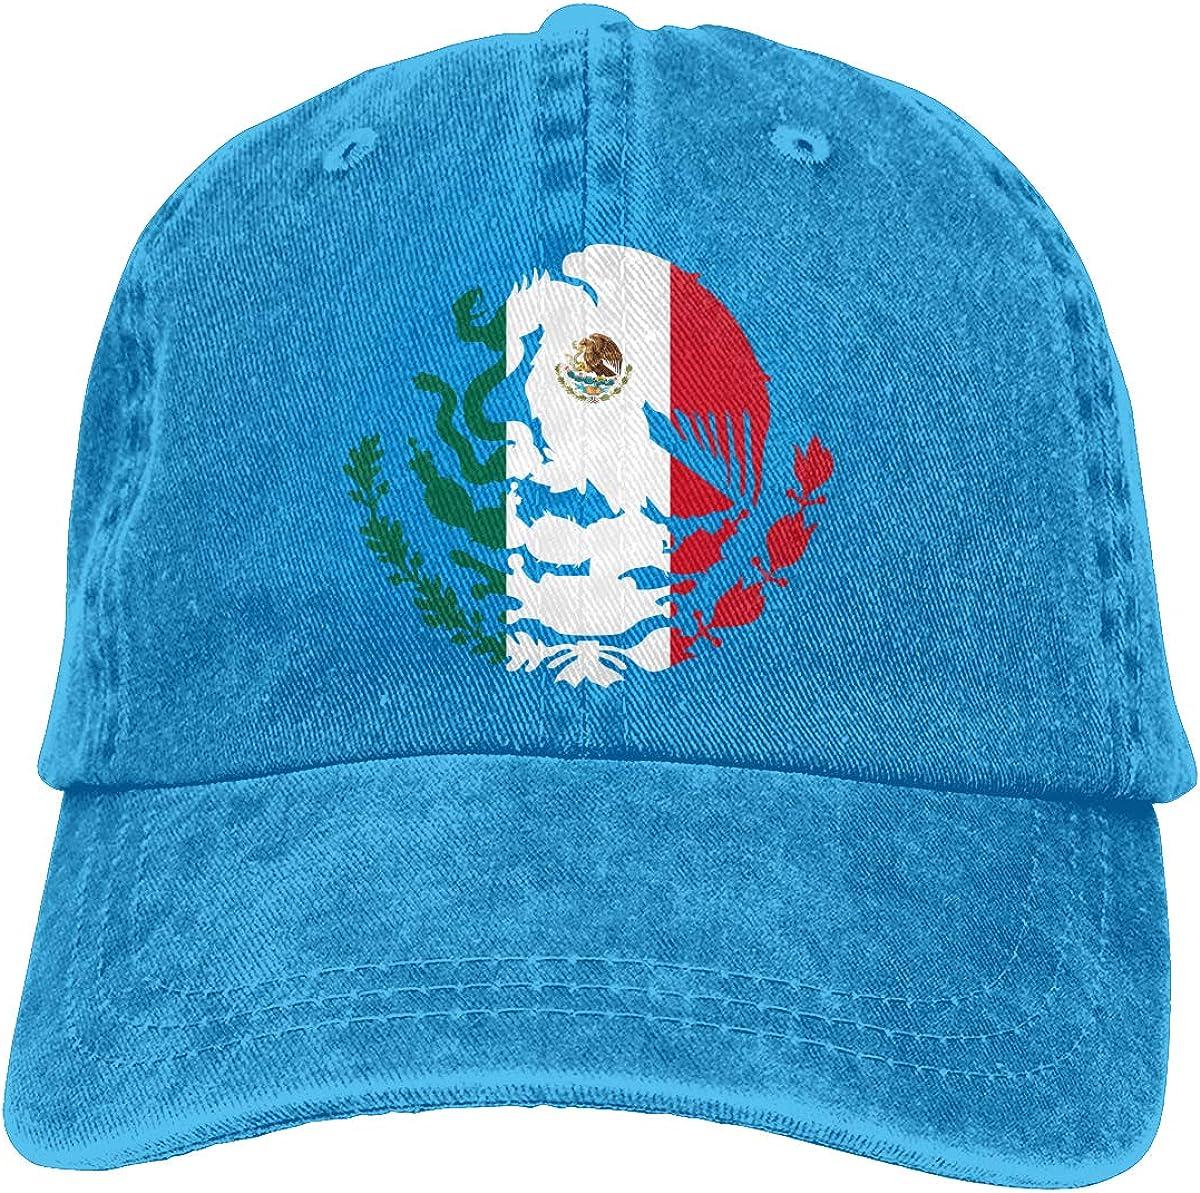 YLW49Y Baseball Cap for Men /& Women Mexico Flag Womens Cotton Adjustable Jeans Cap Hat